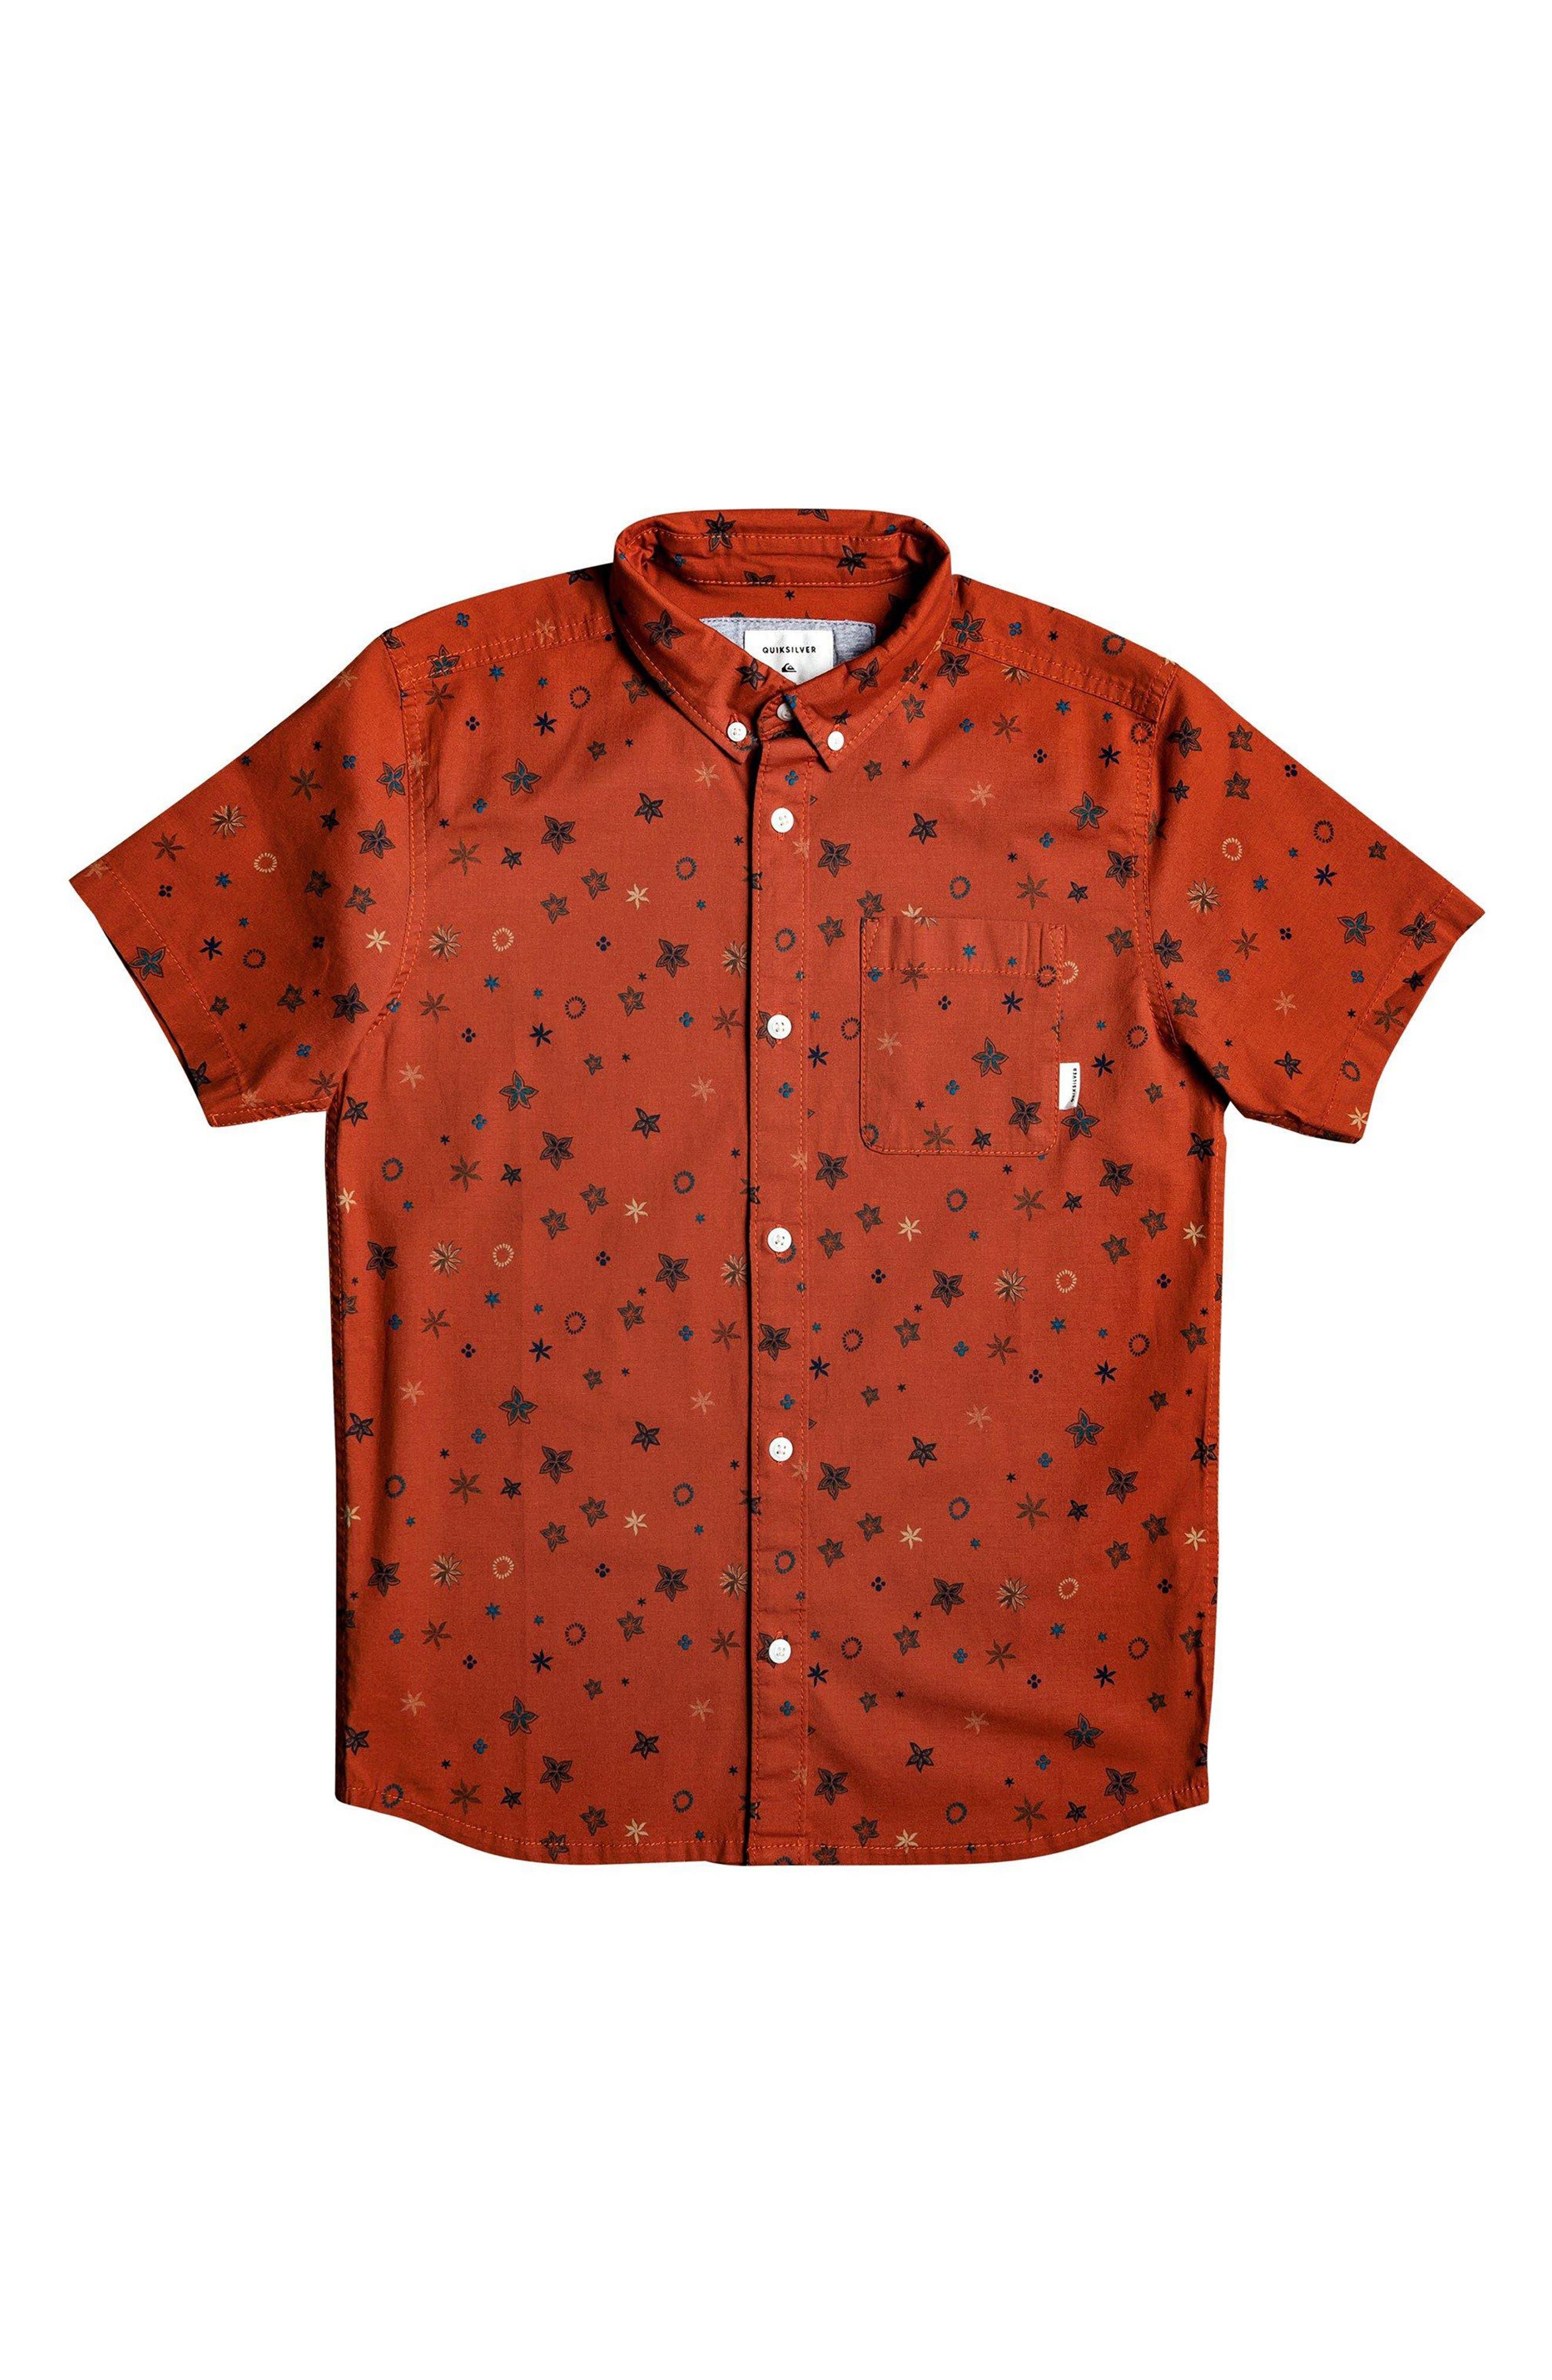 Boys Quiksilver Ditsy Print ButtonDown Shirt Size L (14)  Red